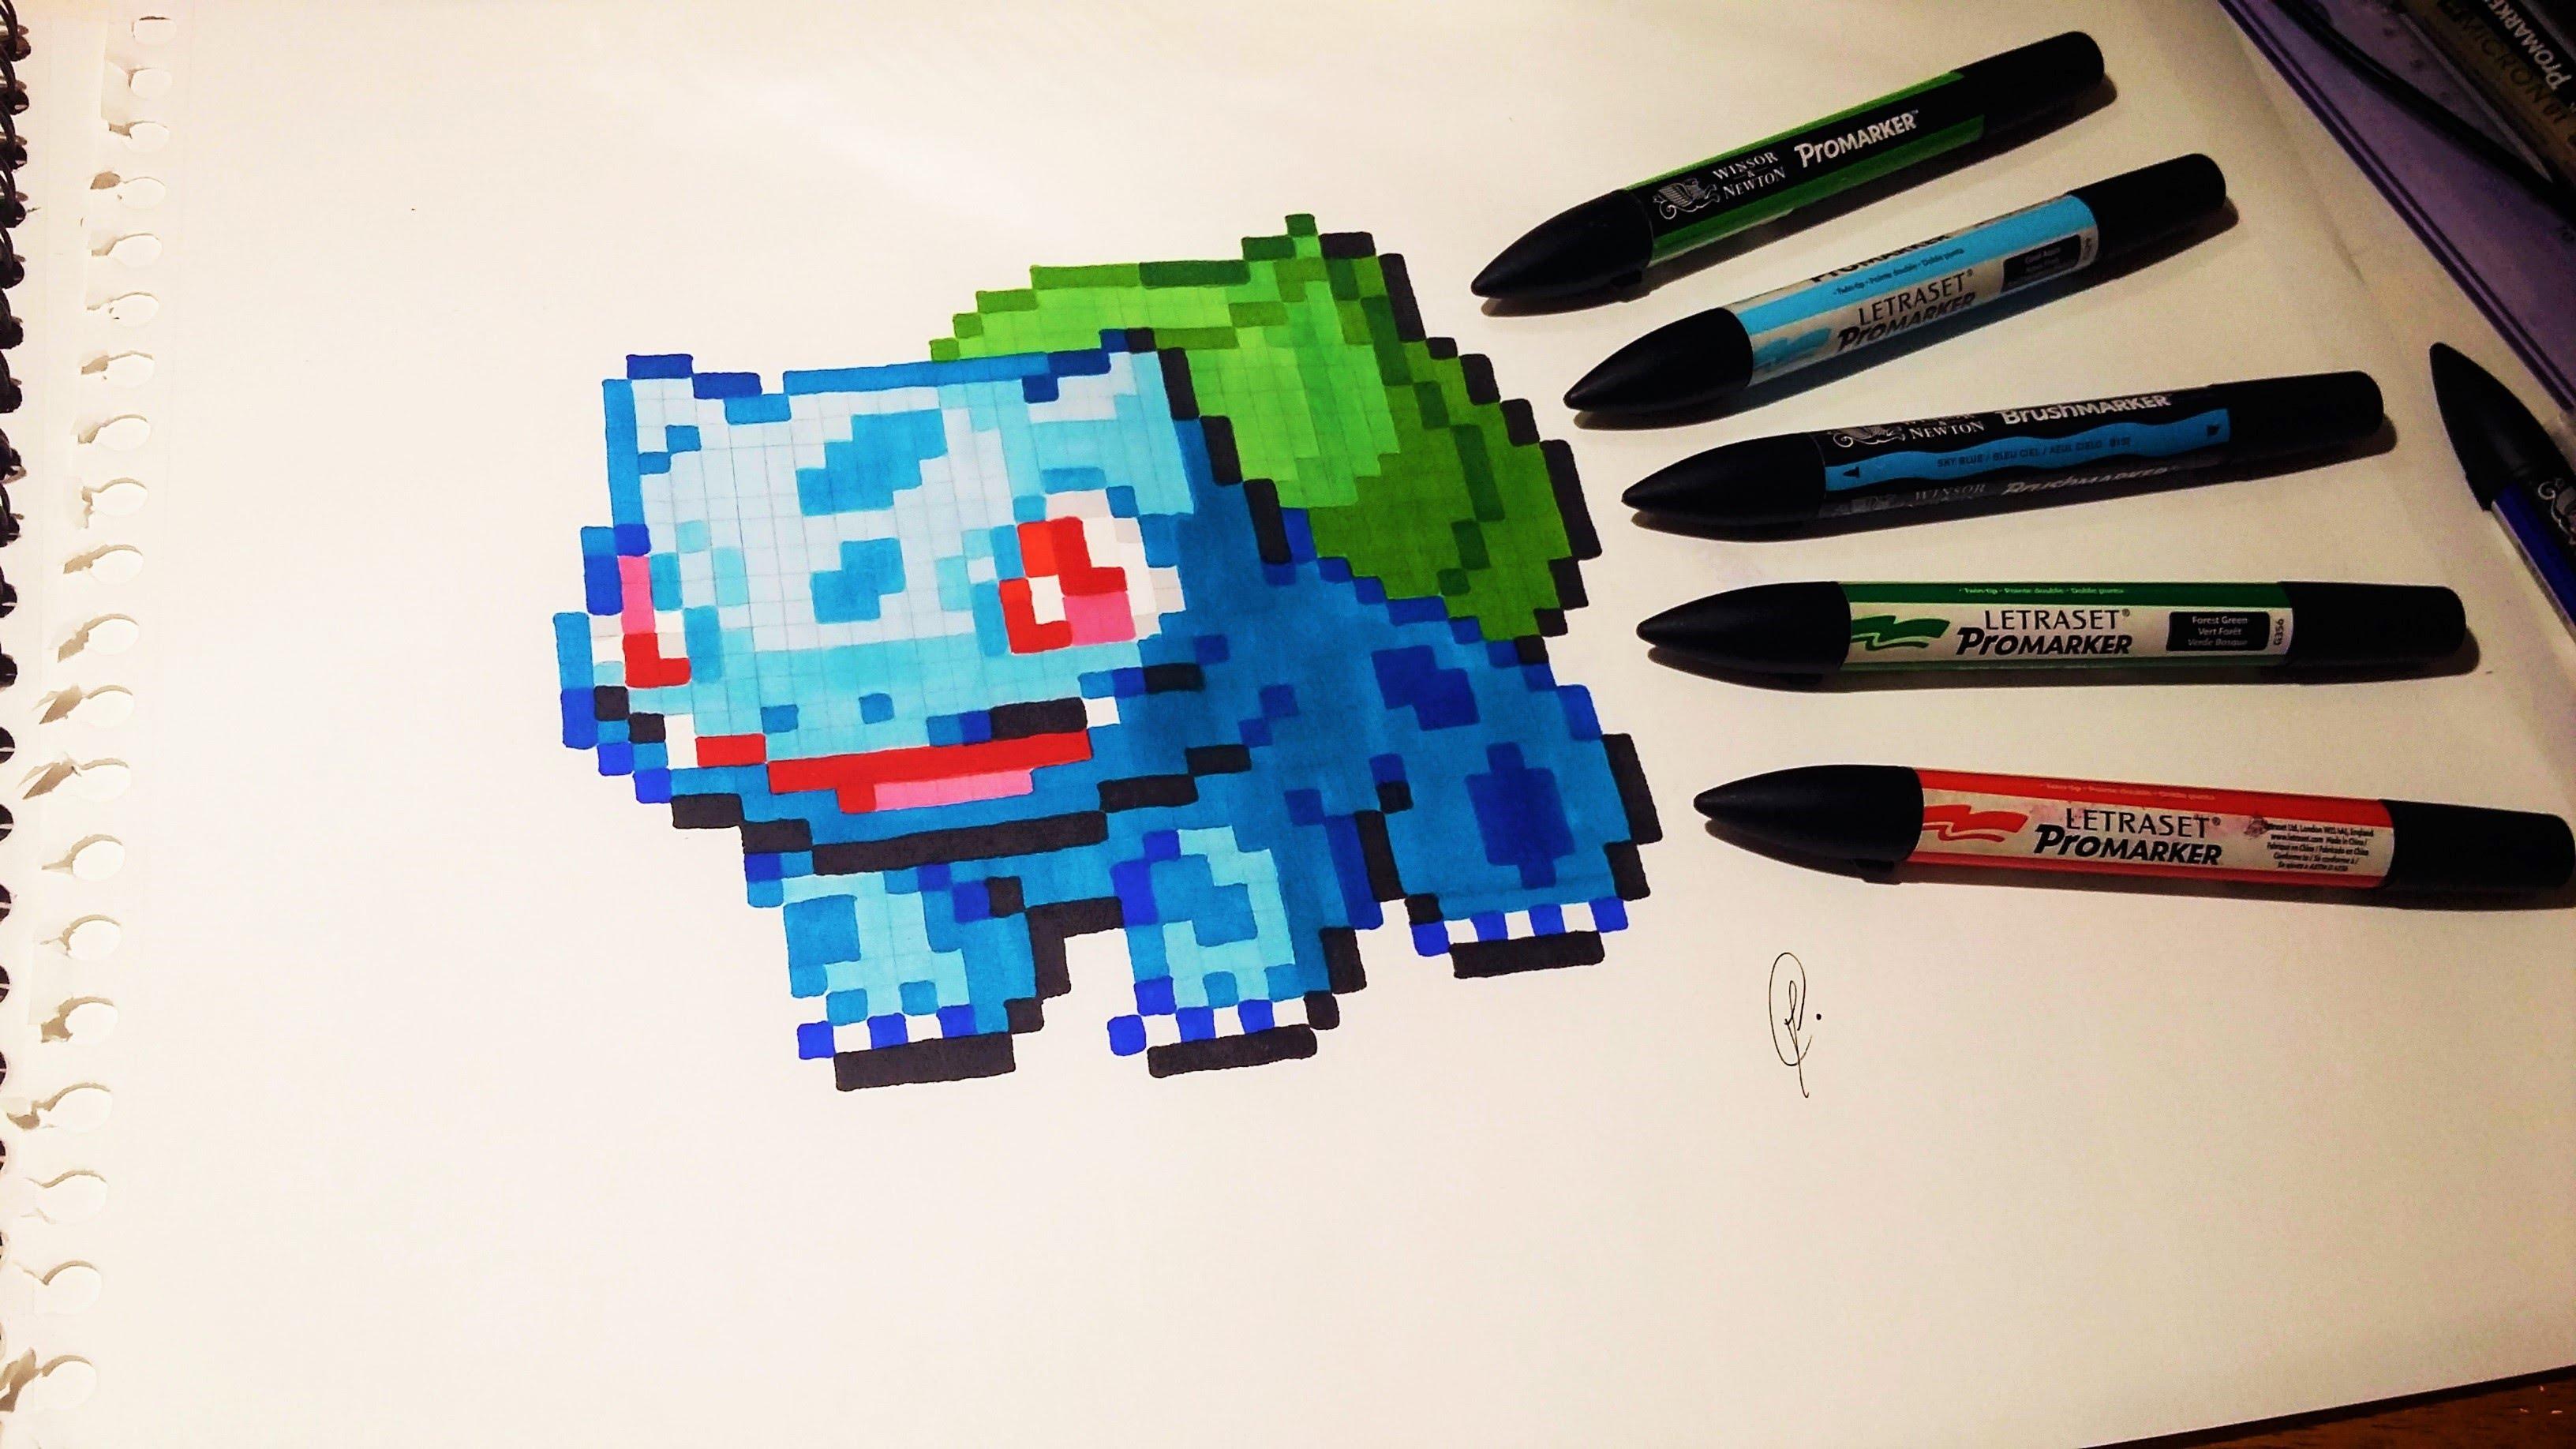 Drawn pixel art pixal Drawing Drawing YouTube Pixel Bulbasaur